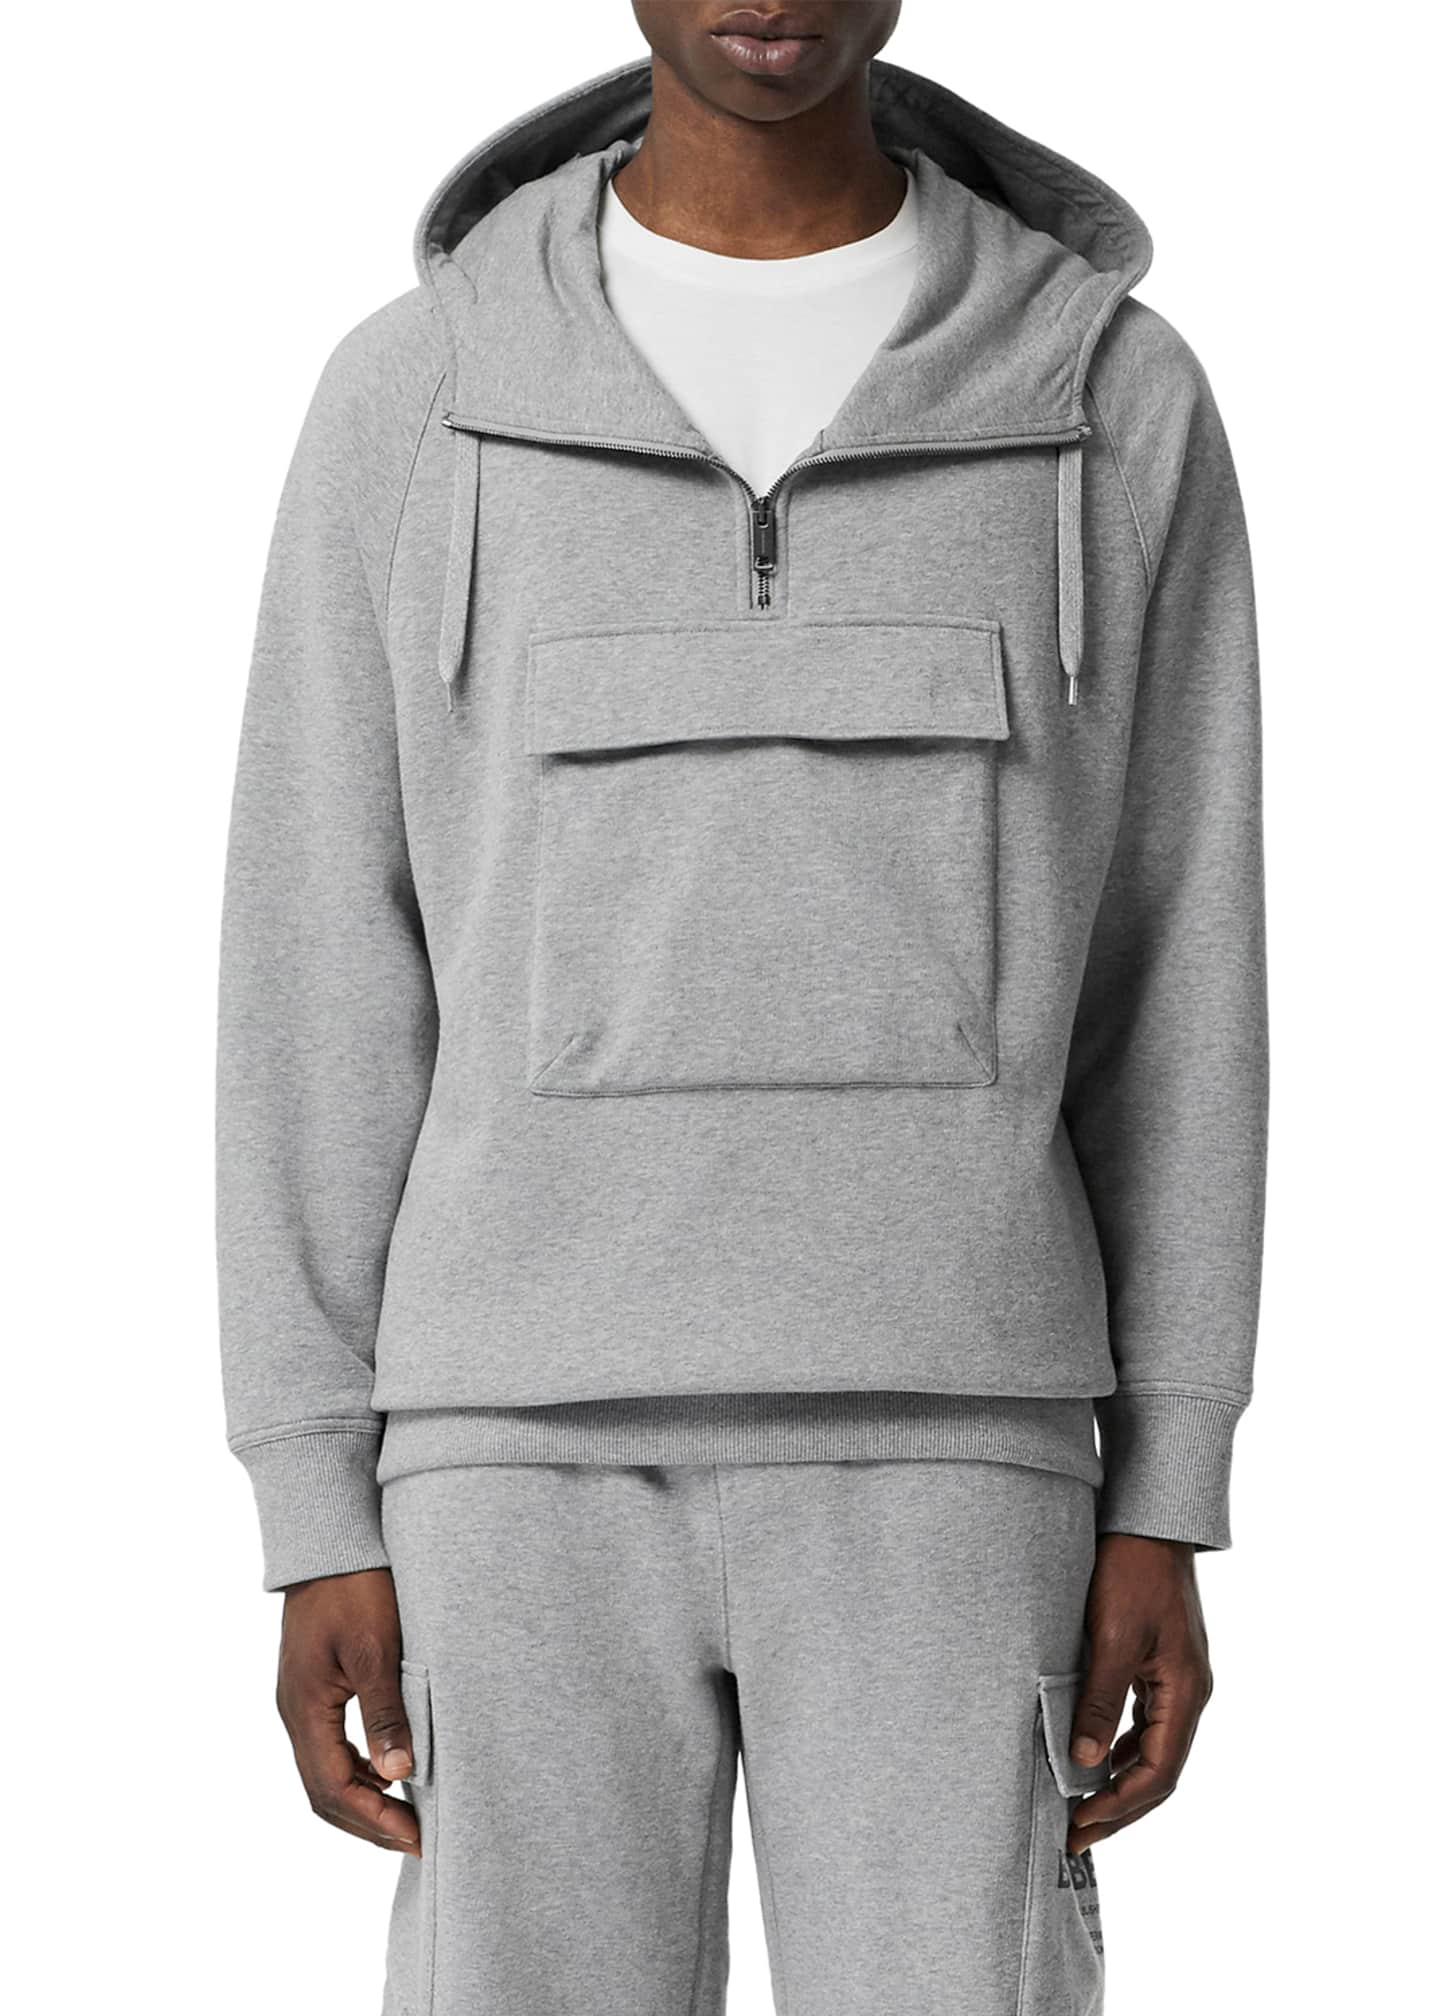 Burberry Men's Hooded Pullover Sport Shirt